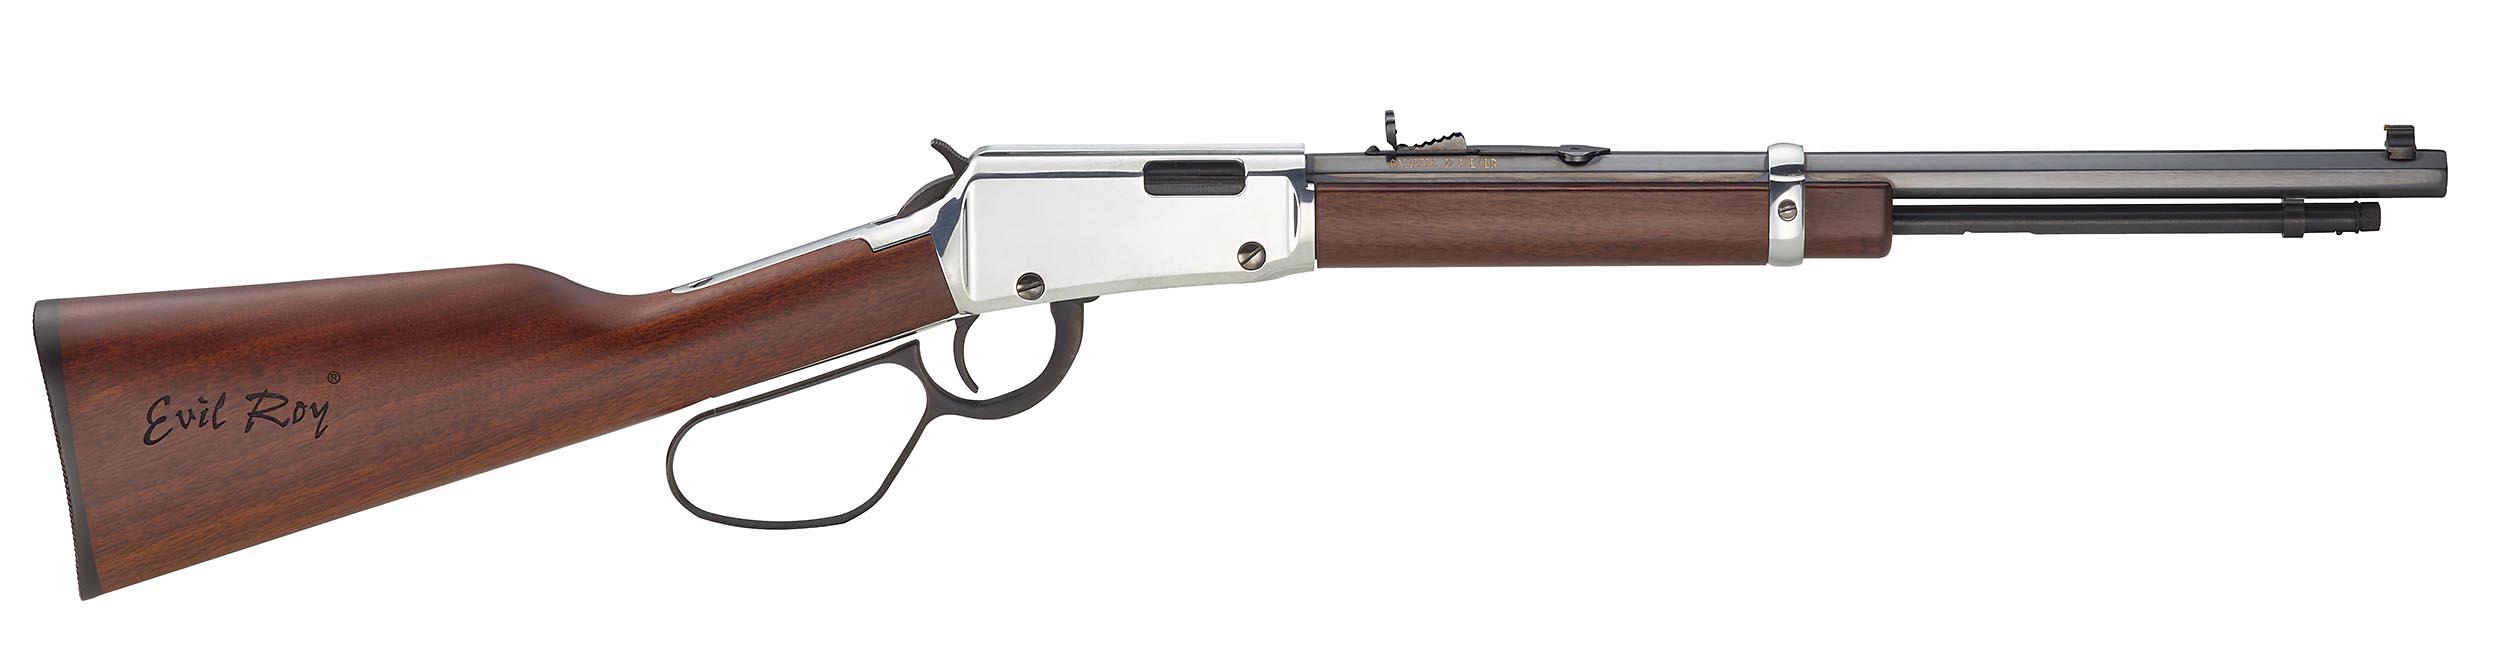 Henry-Rifle-Evil-Roy-22